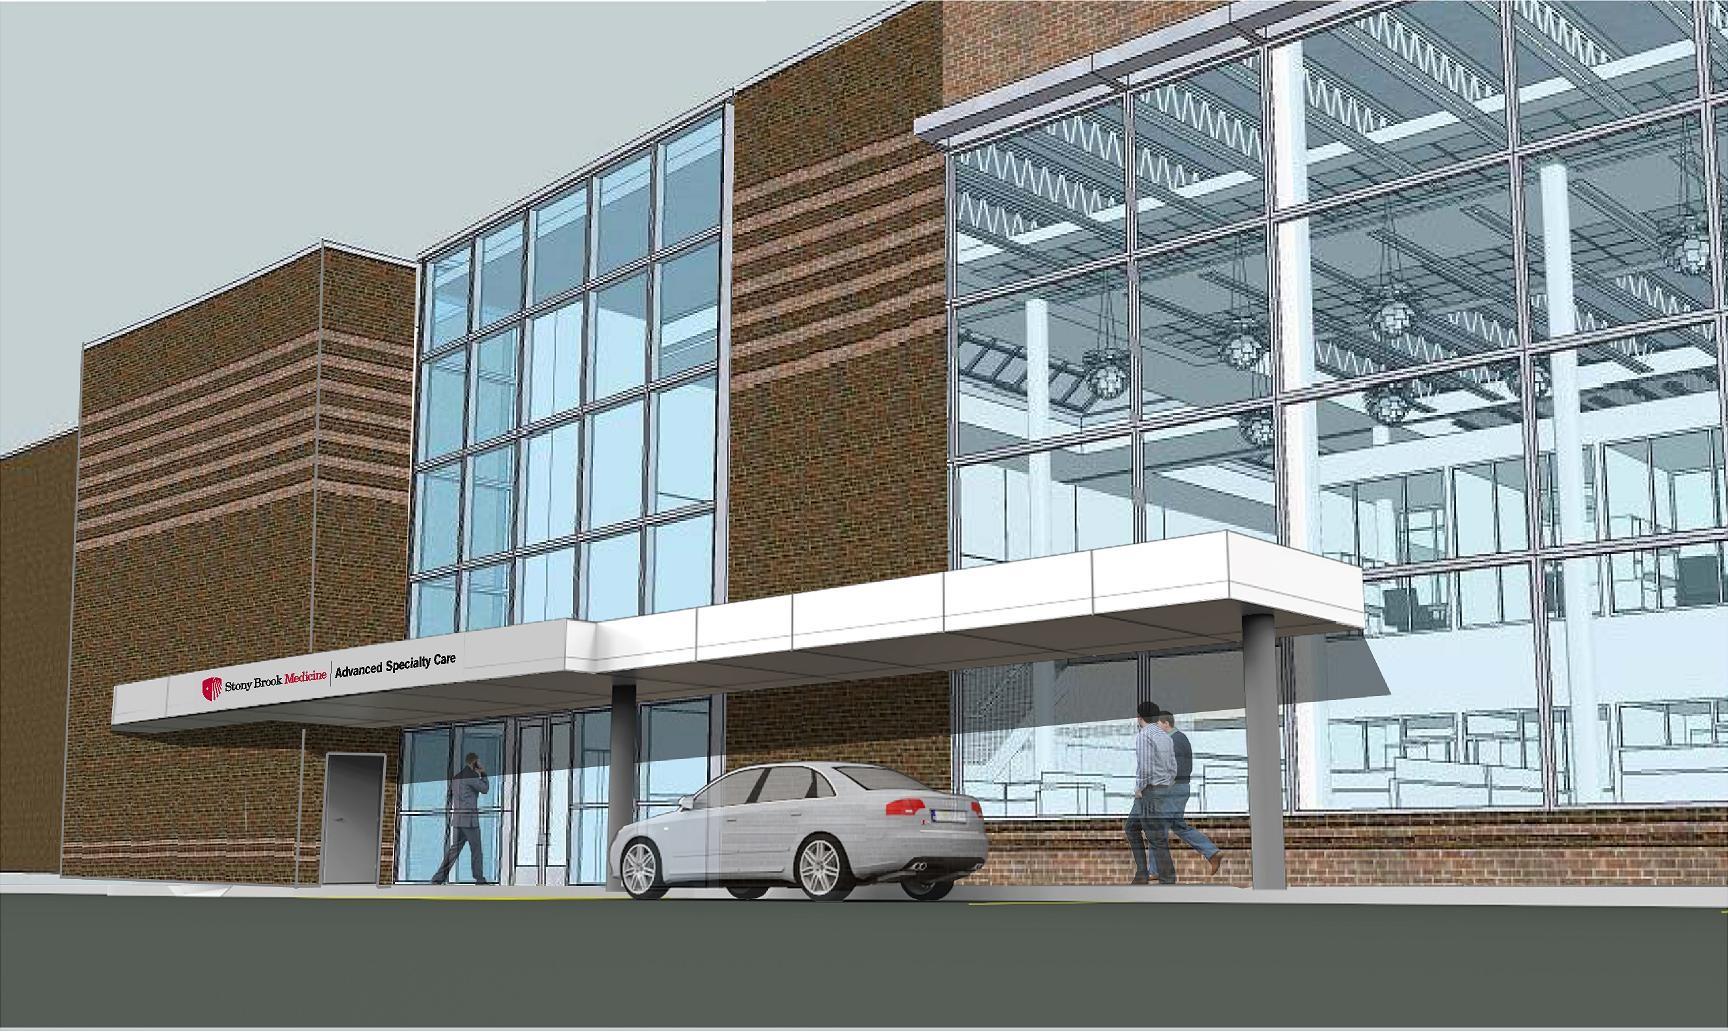 Stony brook medical center jobs-9798